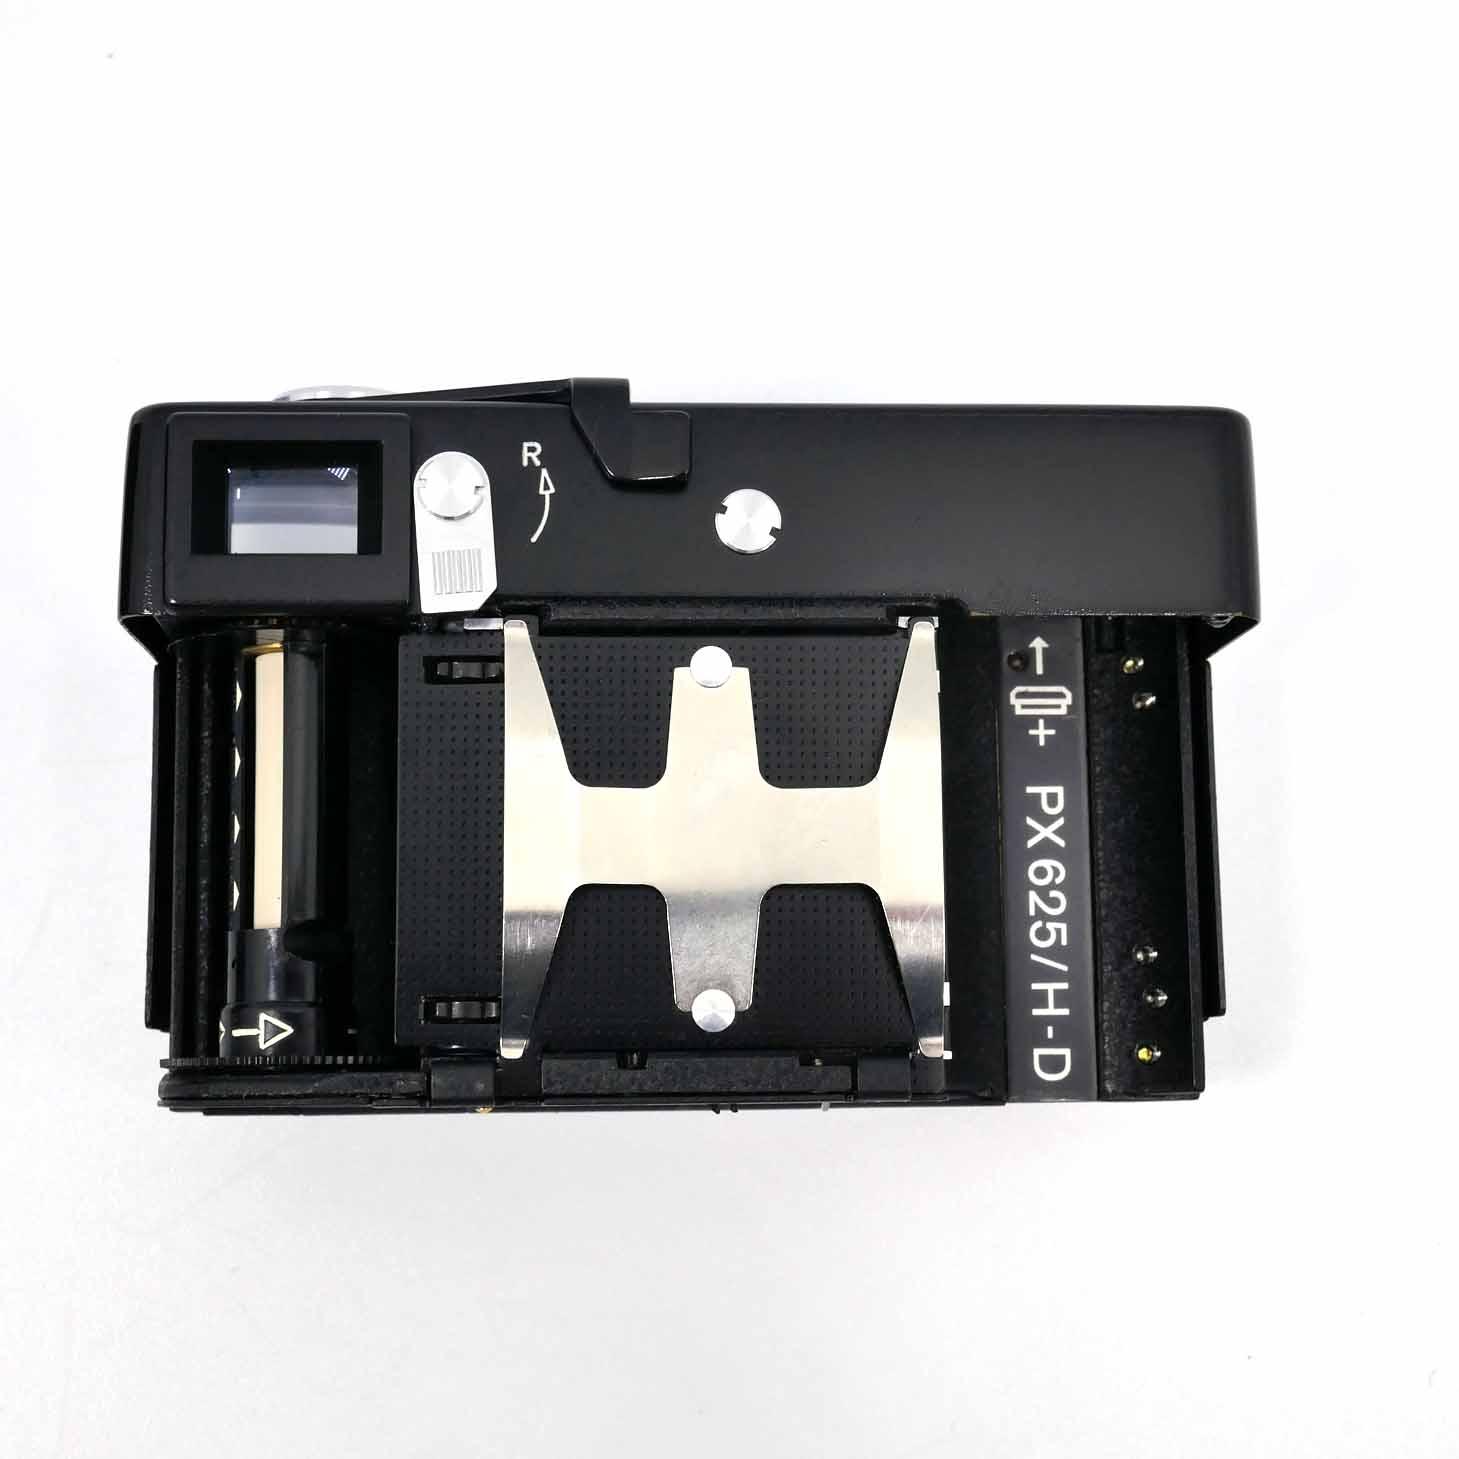 clean-cameras-Rollei-35-S-04